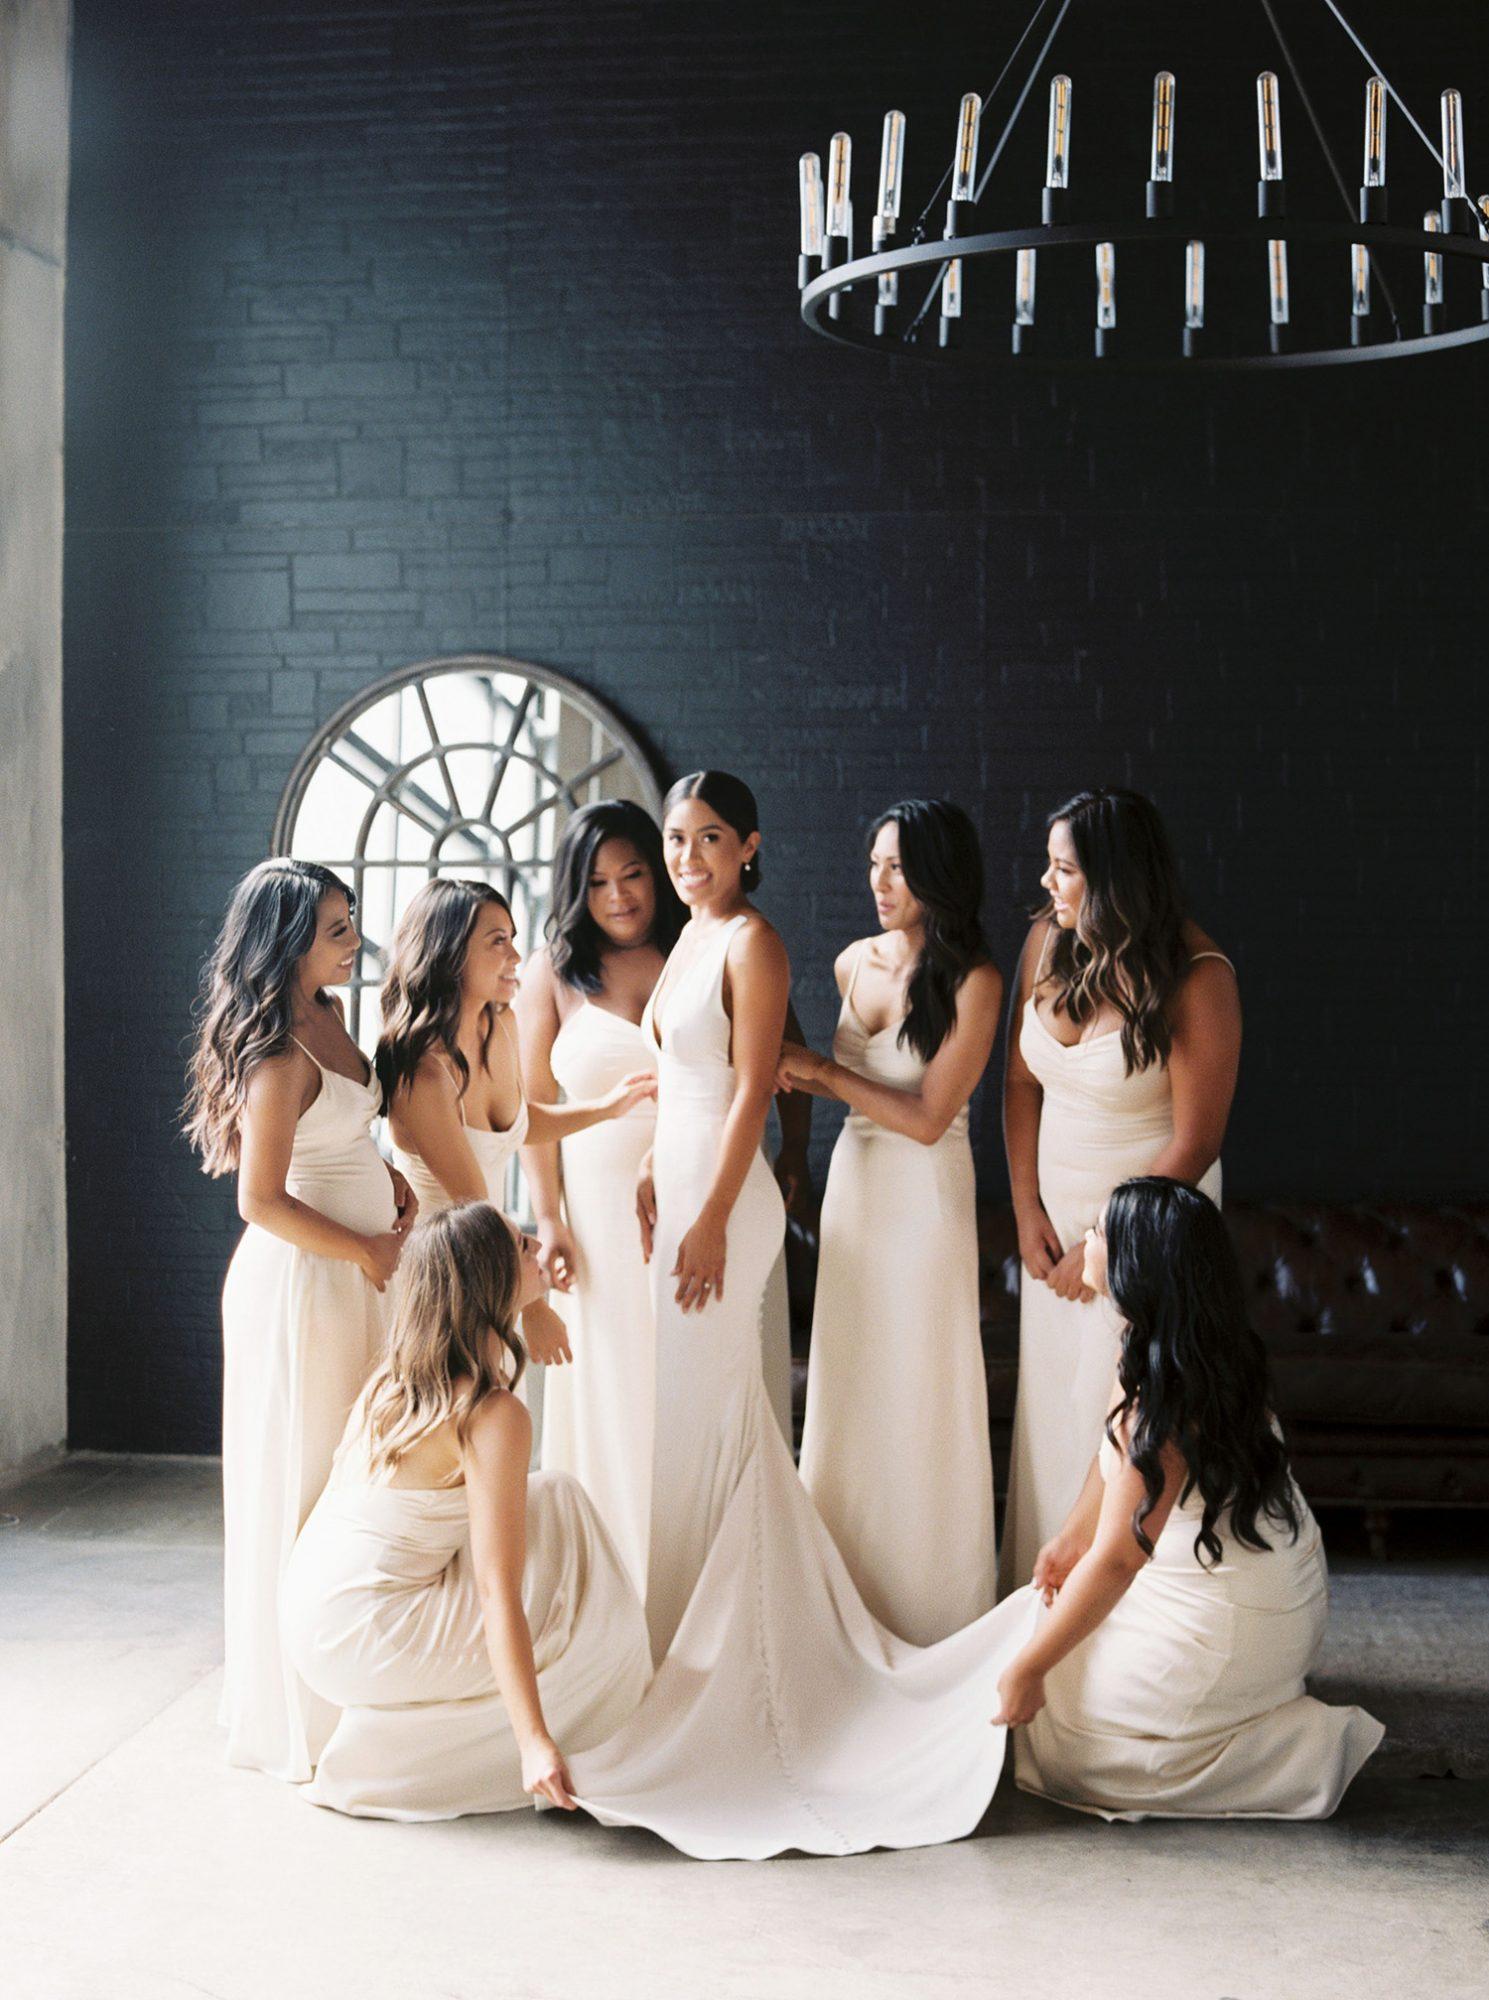 dawn jordan wedding bridesmaids and bride